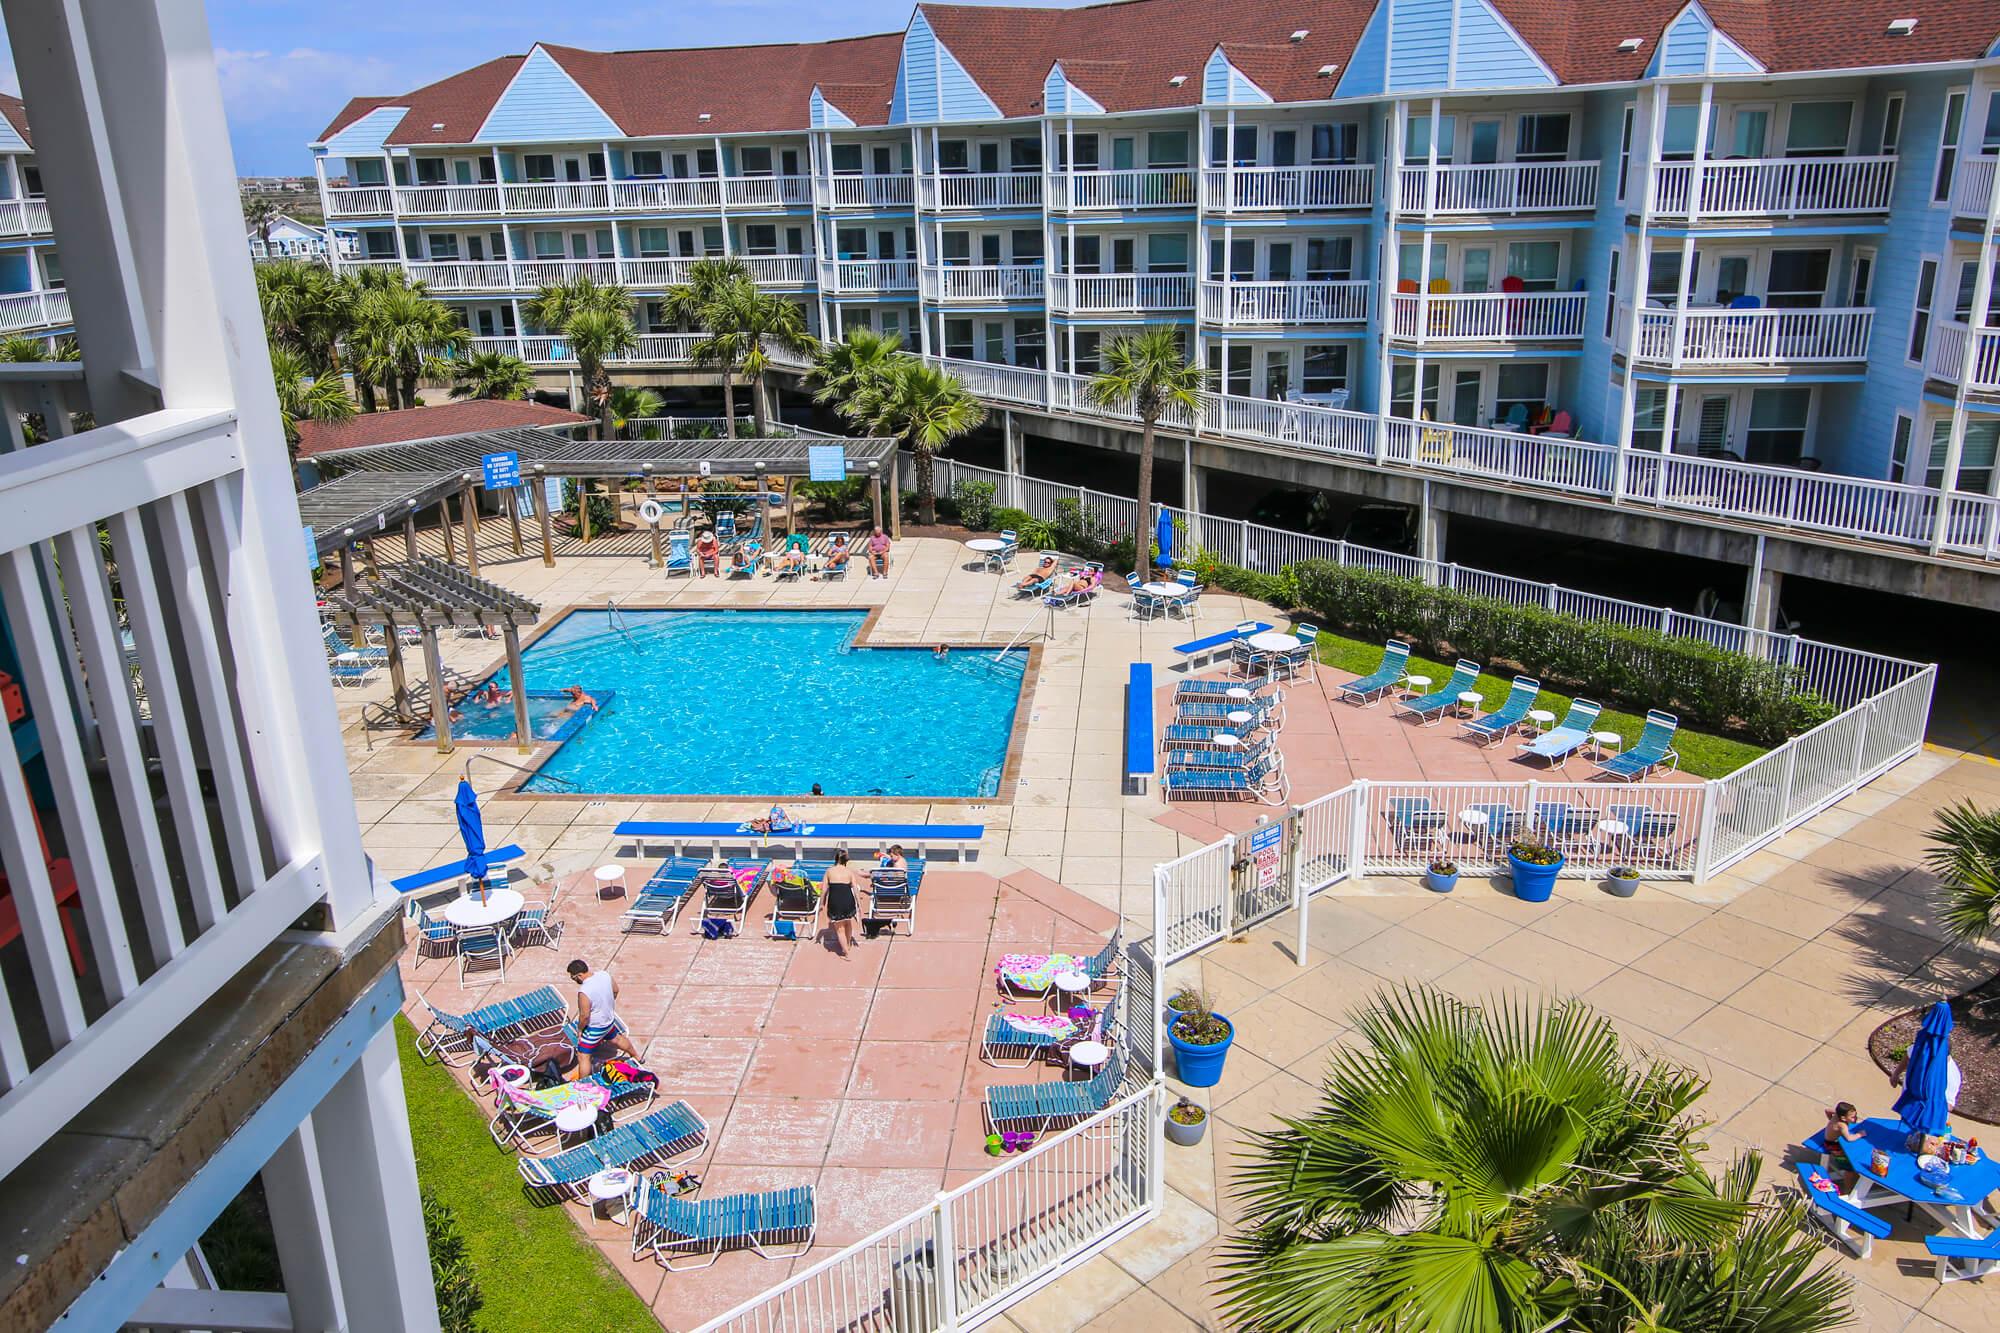 Seascape Resort Community Pool & Courtyard